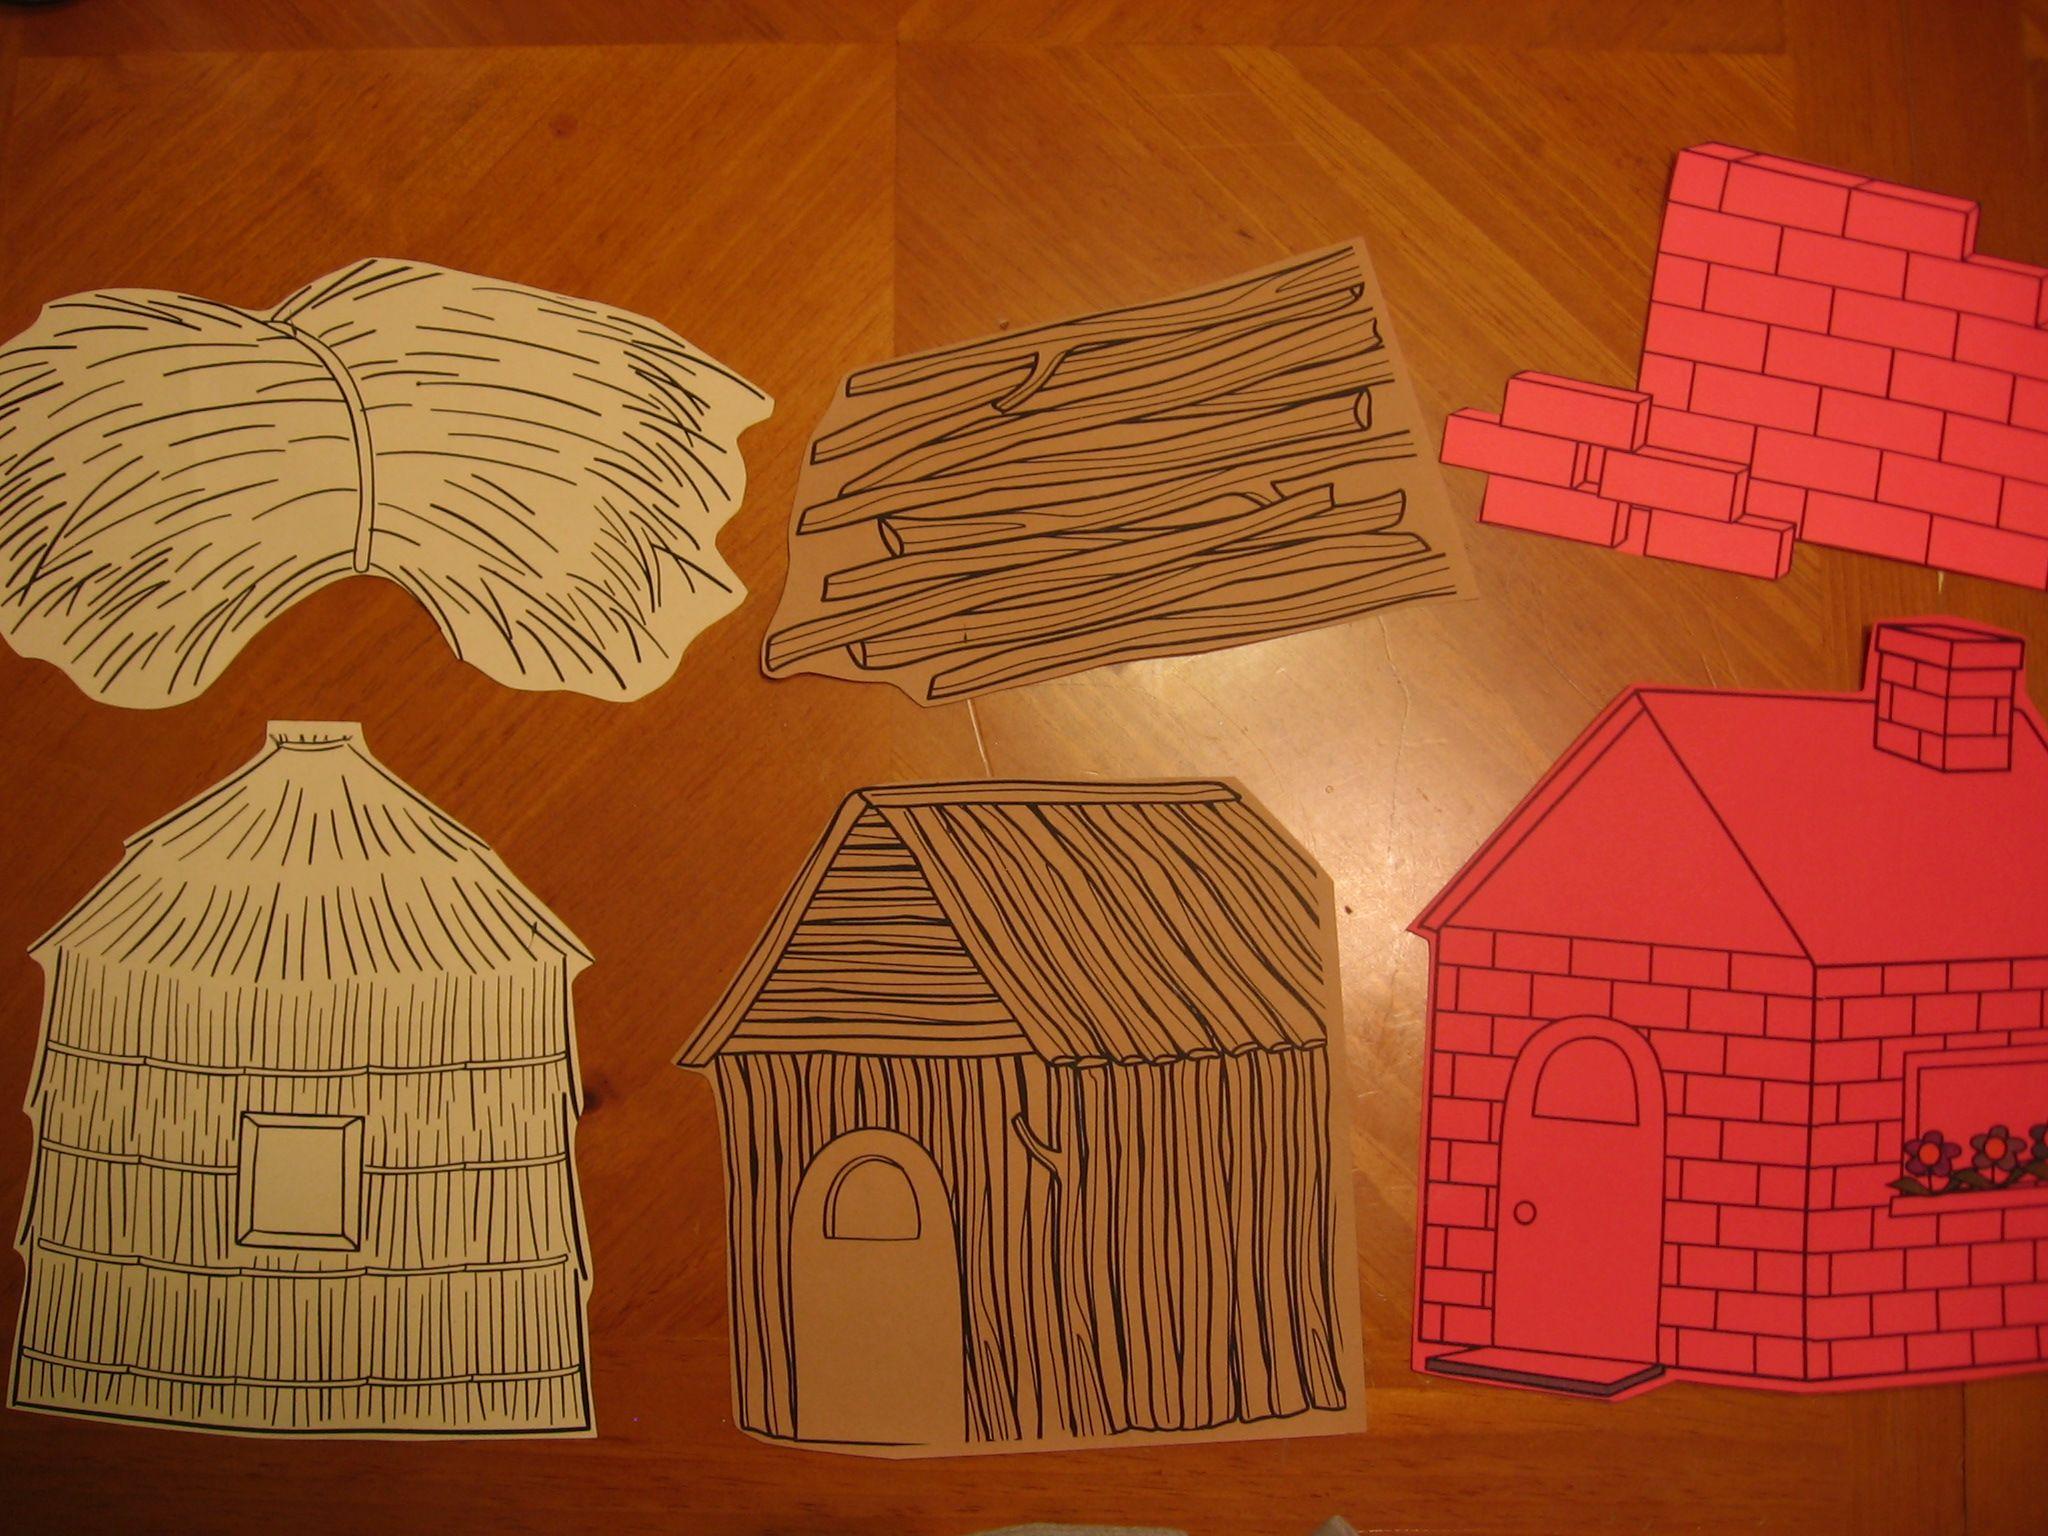 The Three Little Pigs Little Pigs Three Little Pigs Three Little Pigs Houses [ 1536 x 2048 Pixel ]